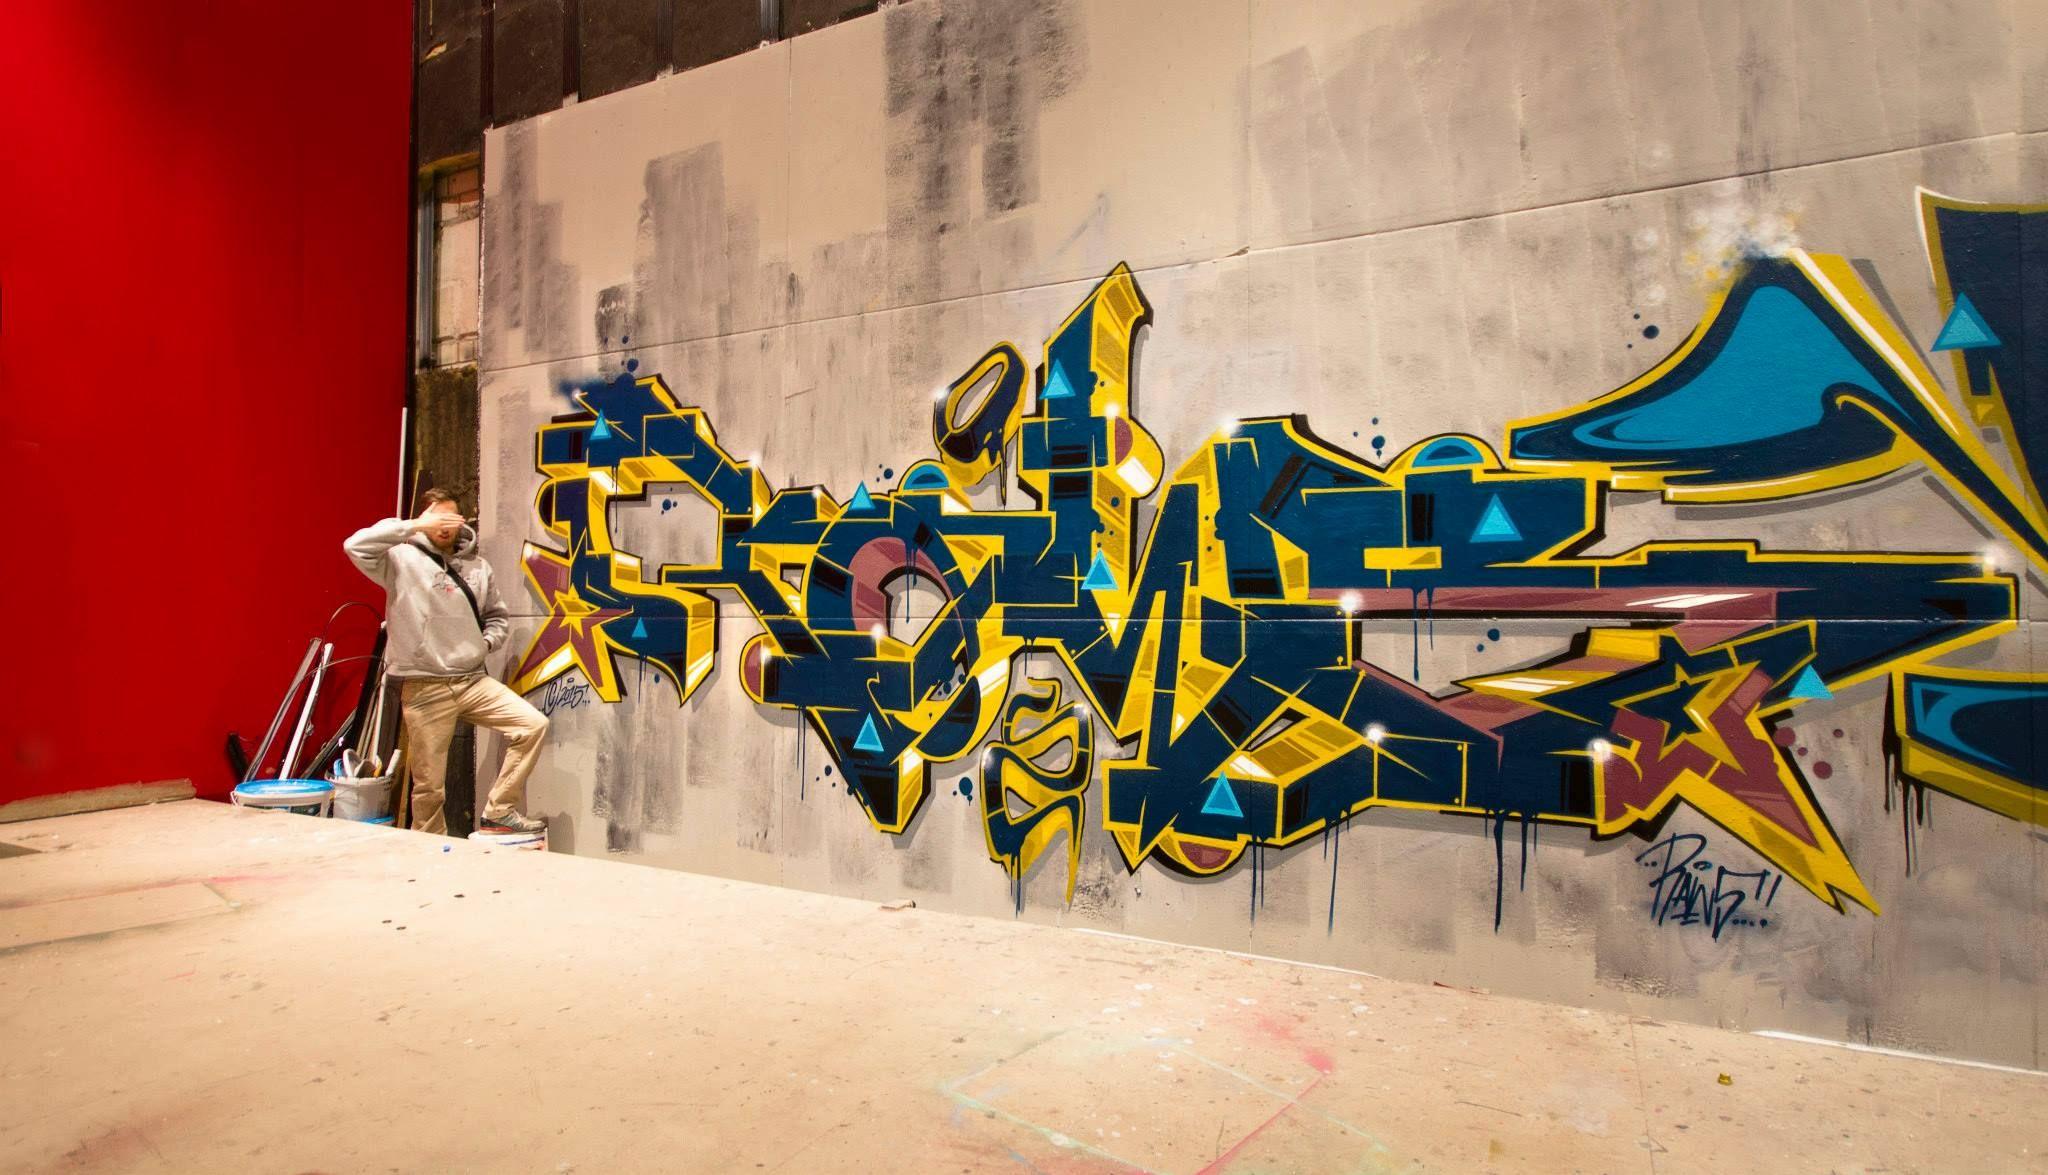 TopTen x Sofles | I Love Graffiti DE in 2020 | Streetart